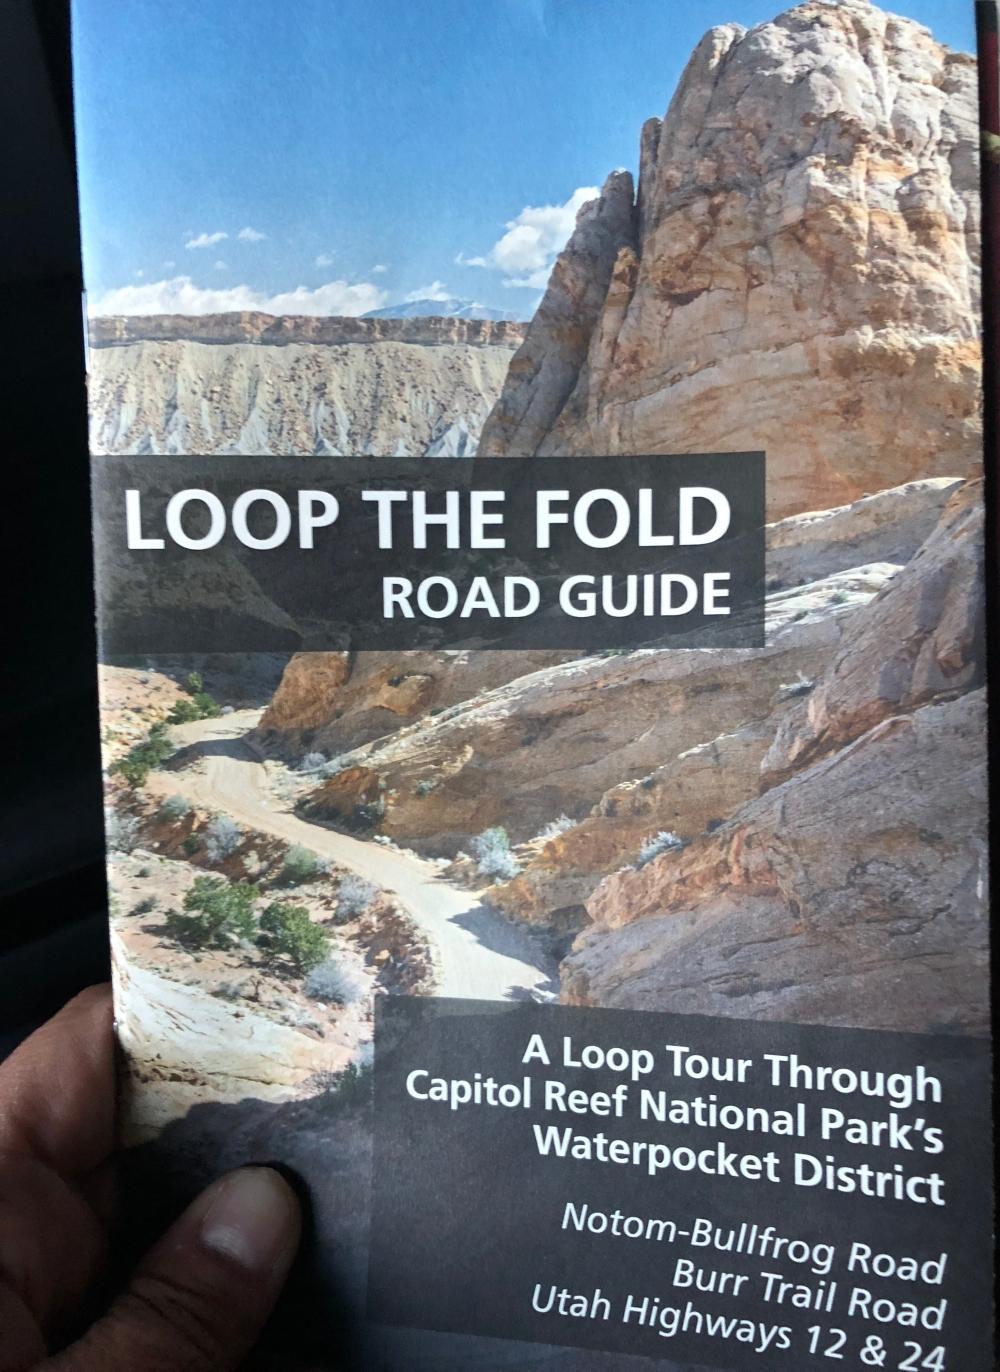 LoopTheFold